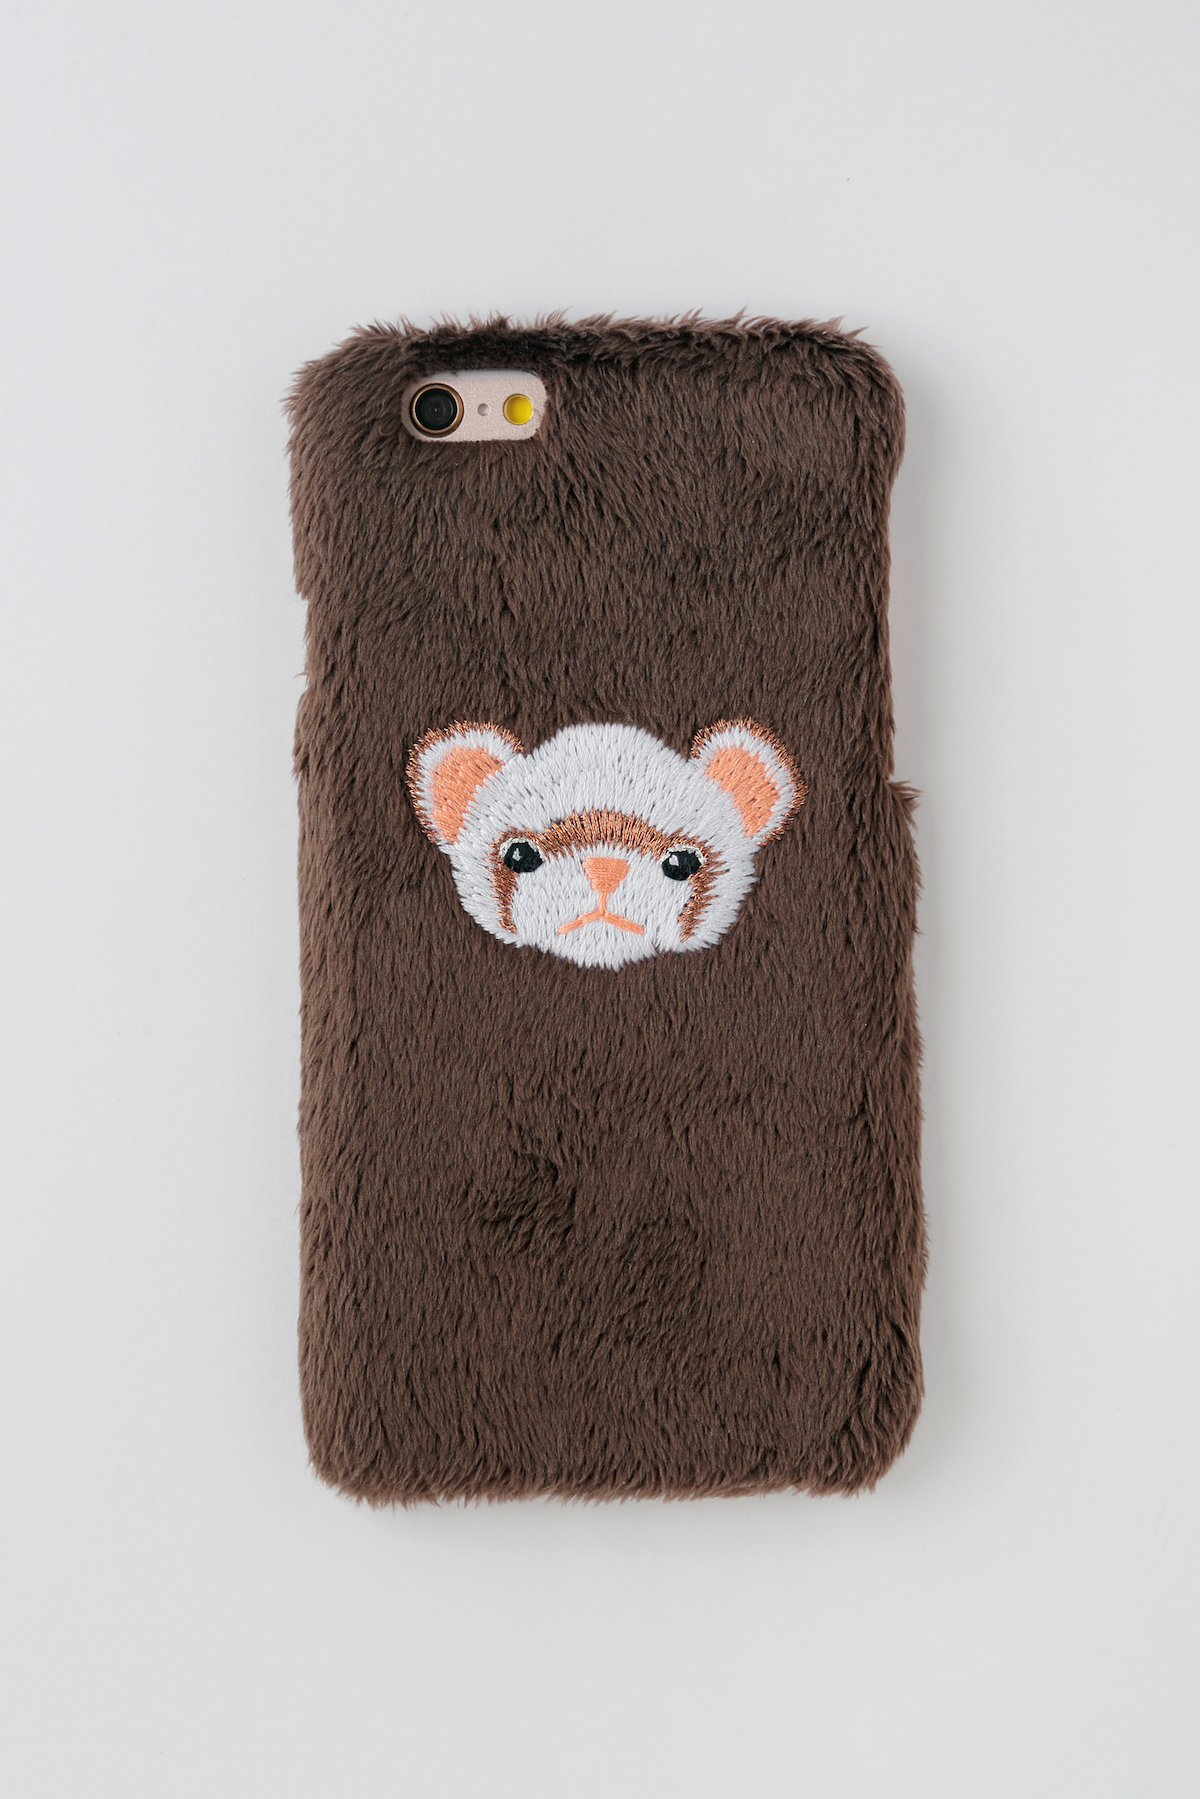 【iPhone7,8専用】フェレットiPhoneハードケース【セーブル】